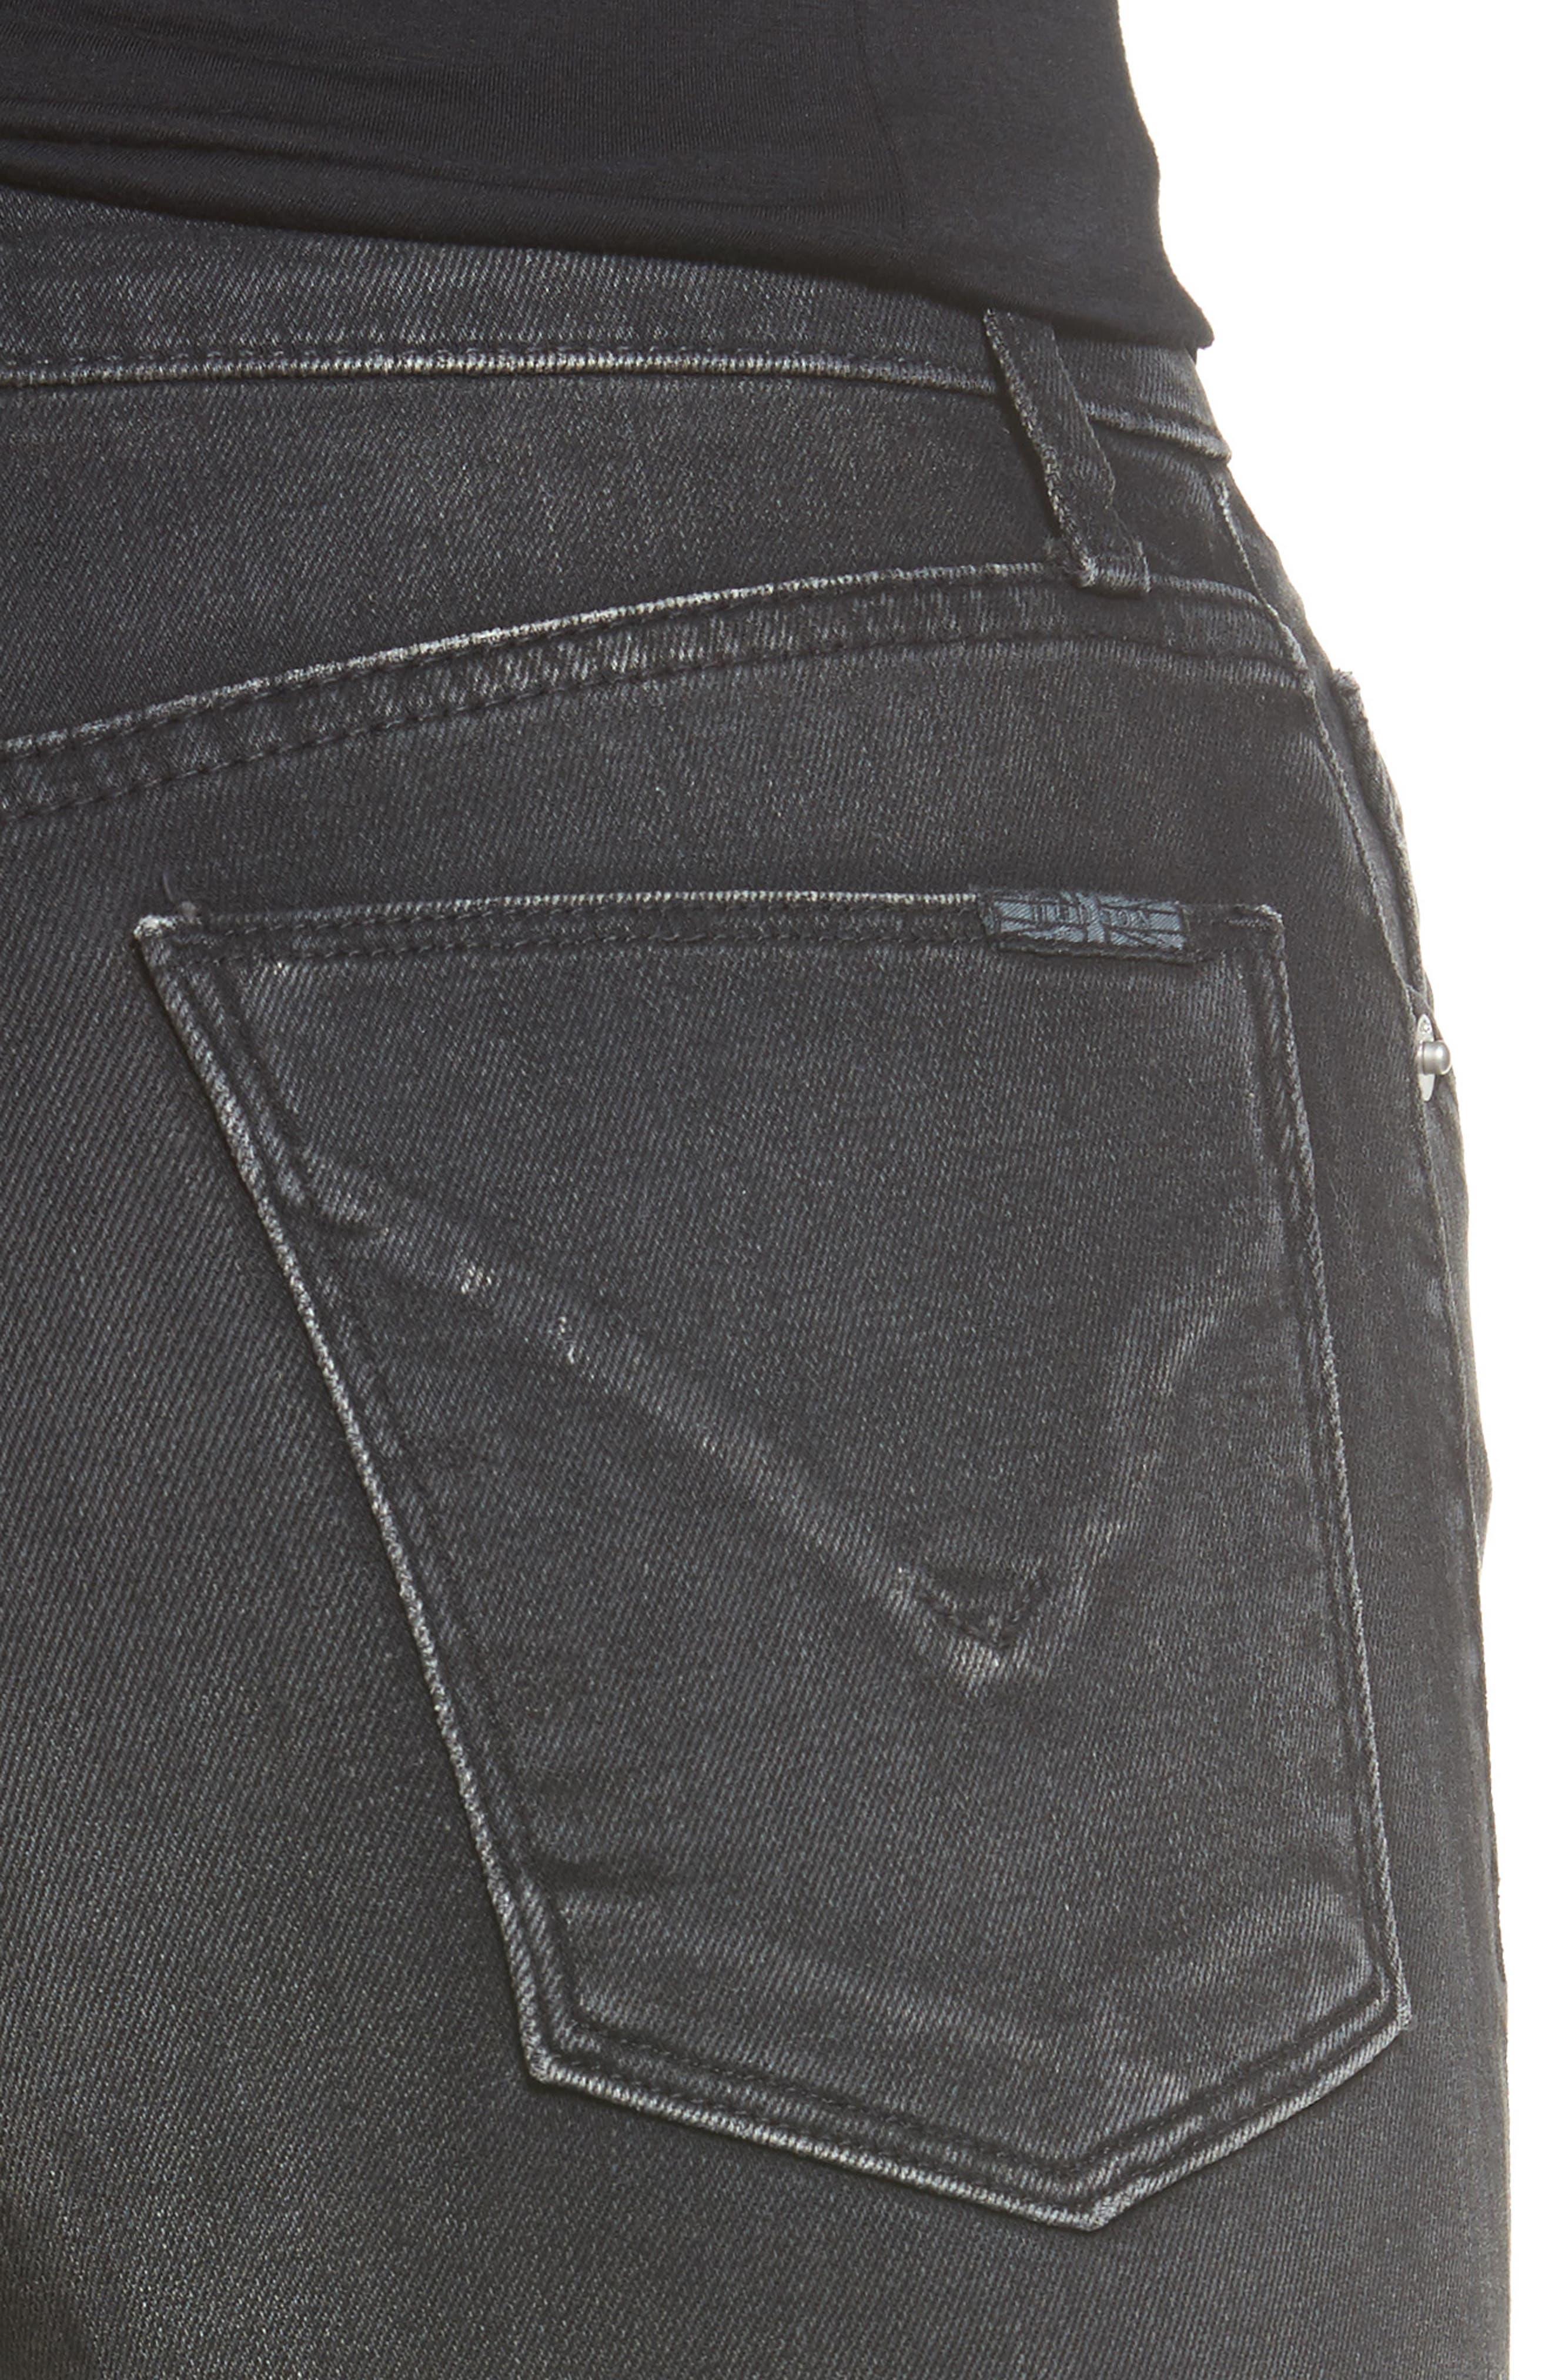 Heartbreaker High Waist Bootcut Jeans,                             Alternate thumbnail 4, color,                             Abandon